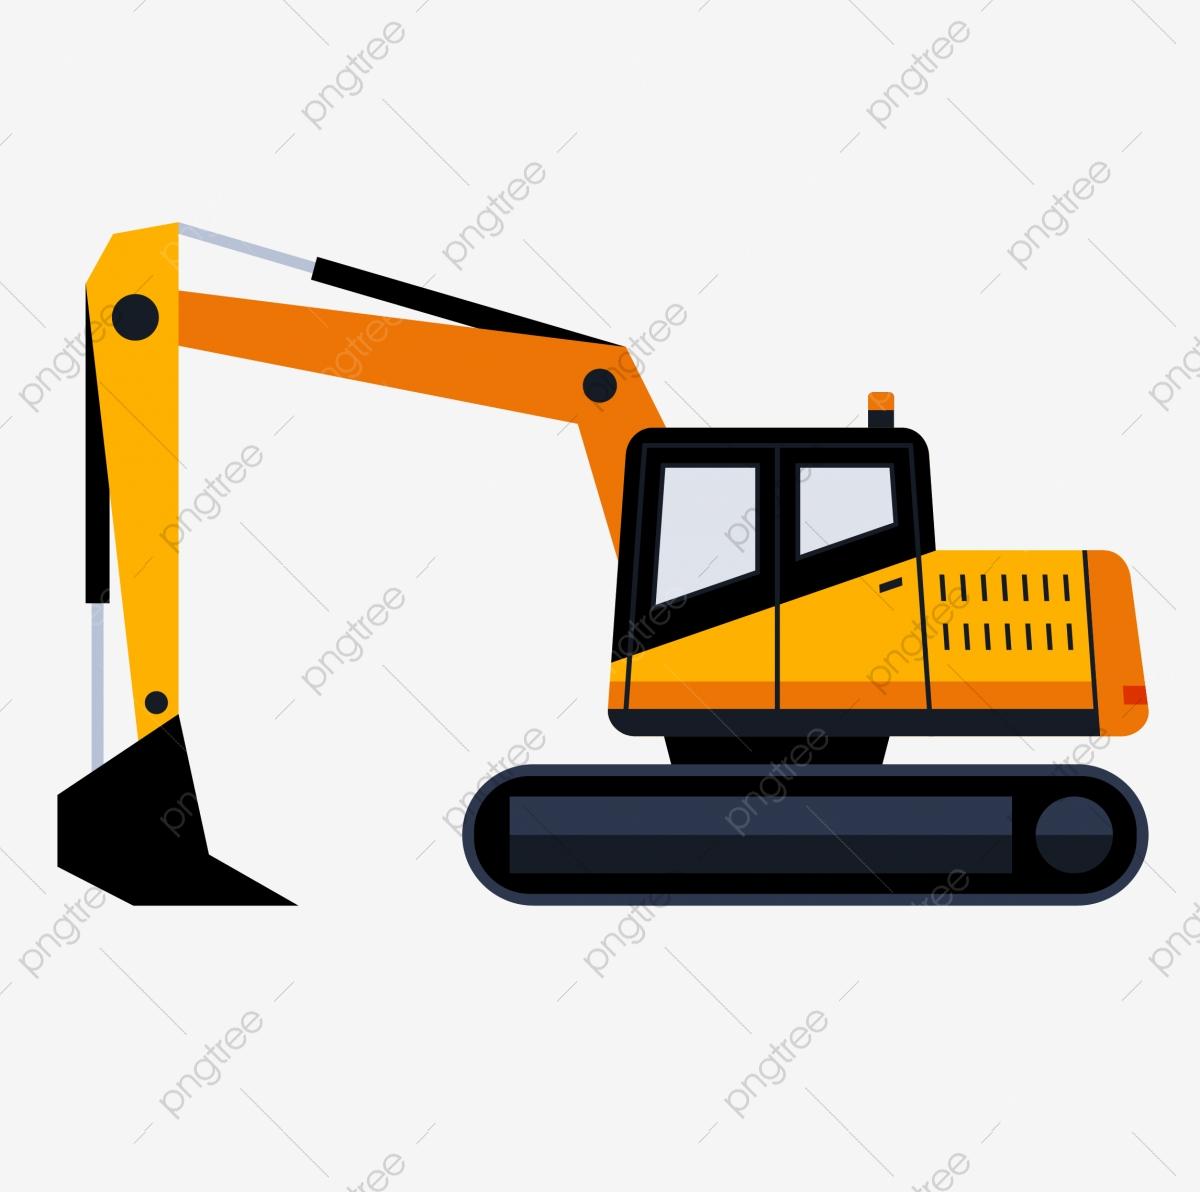 Crane site construction vehicle. Excavator clipart building equipment